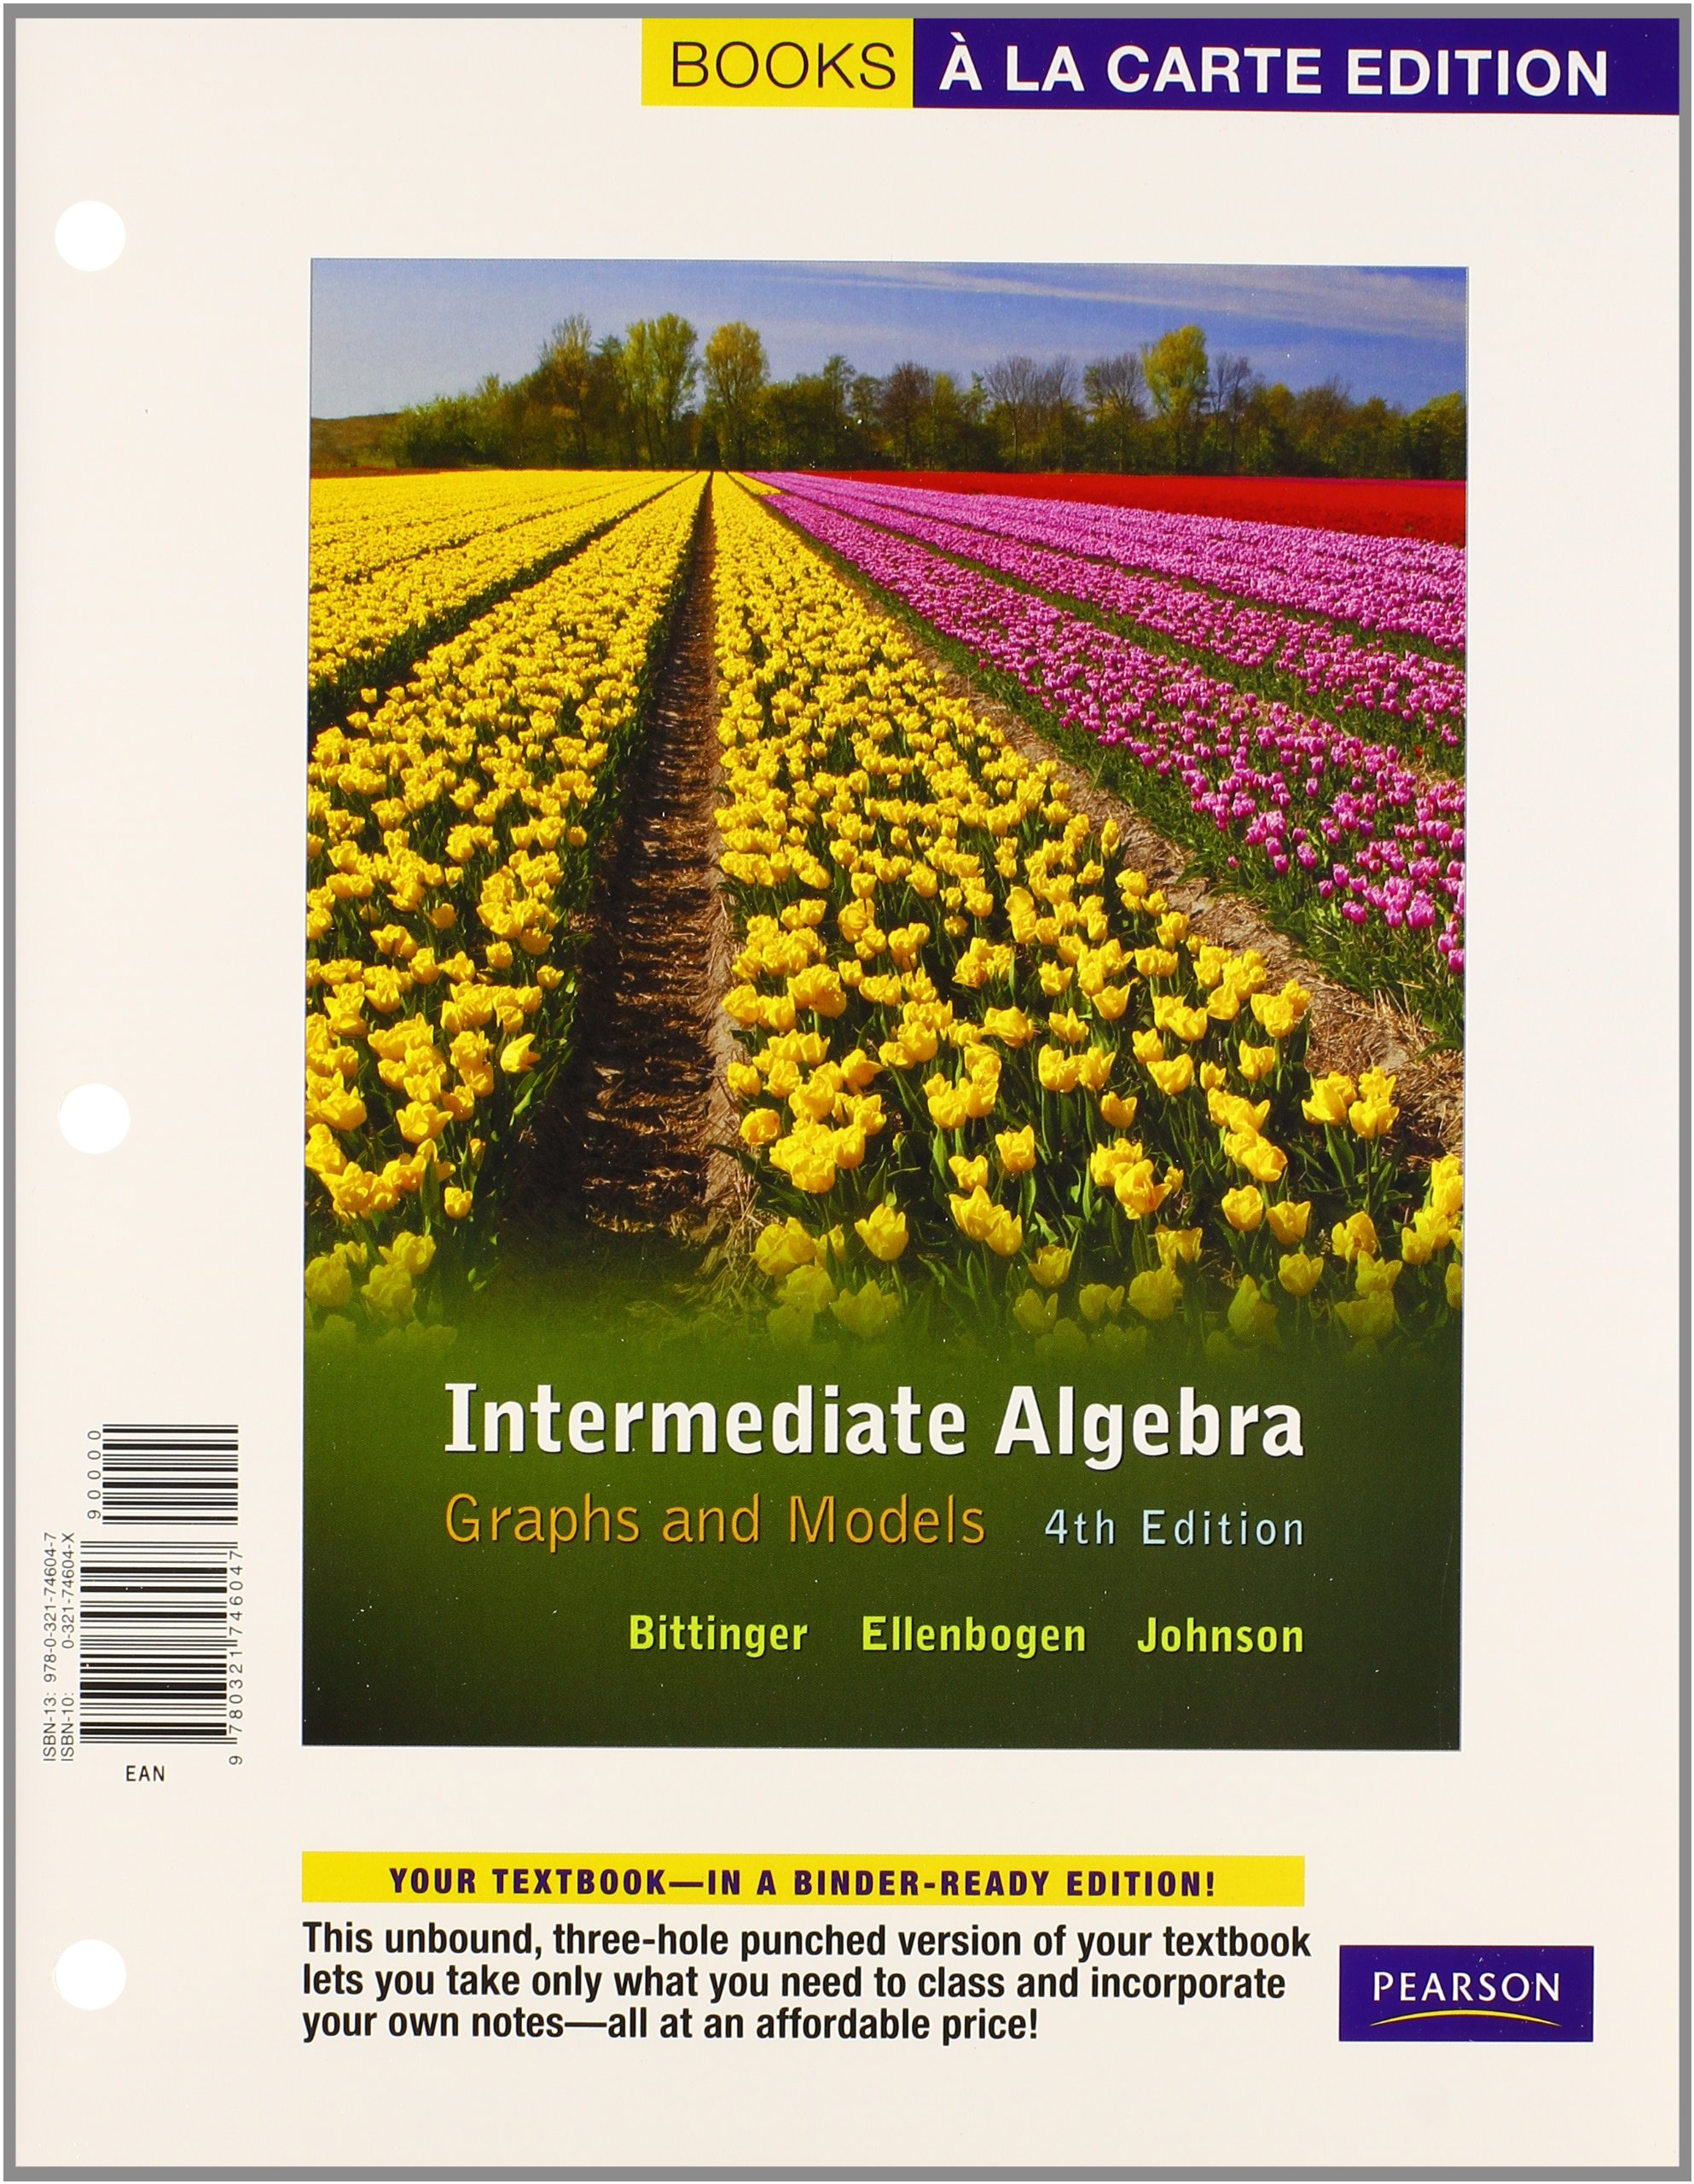 Intermediate Algebra: Graphs and Models, Books a la Carte Plus MML/Msl (for  Ad Hoc Valuepacks) -- Access Card Package: Amazon.co.uk: Marvin L  Bittinger, ...